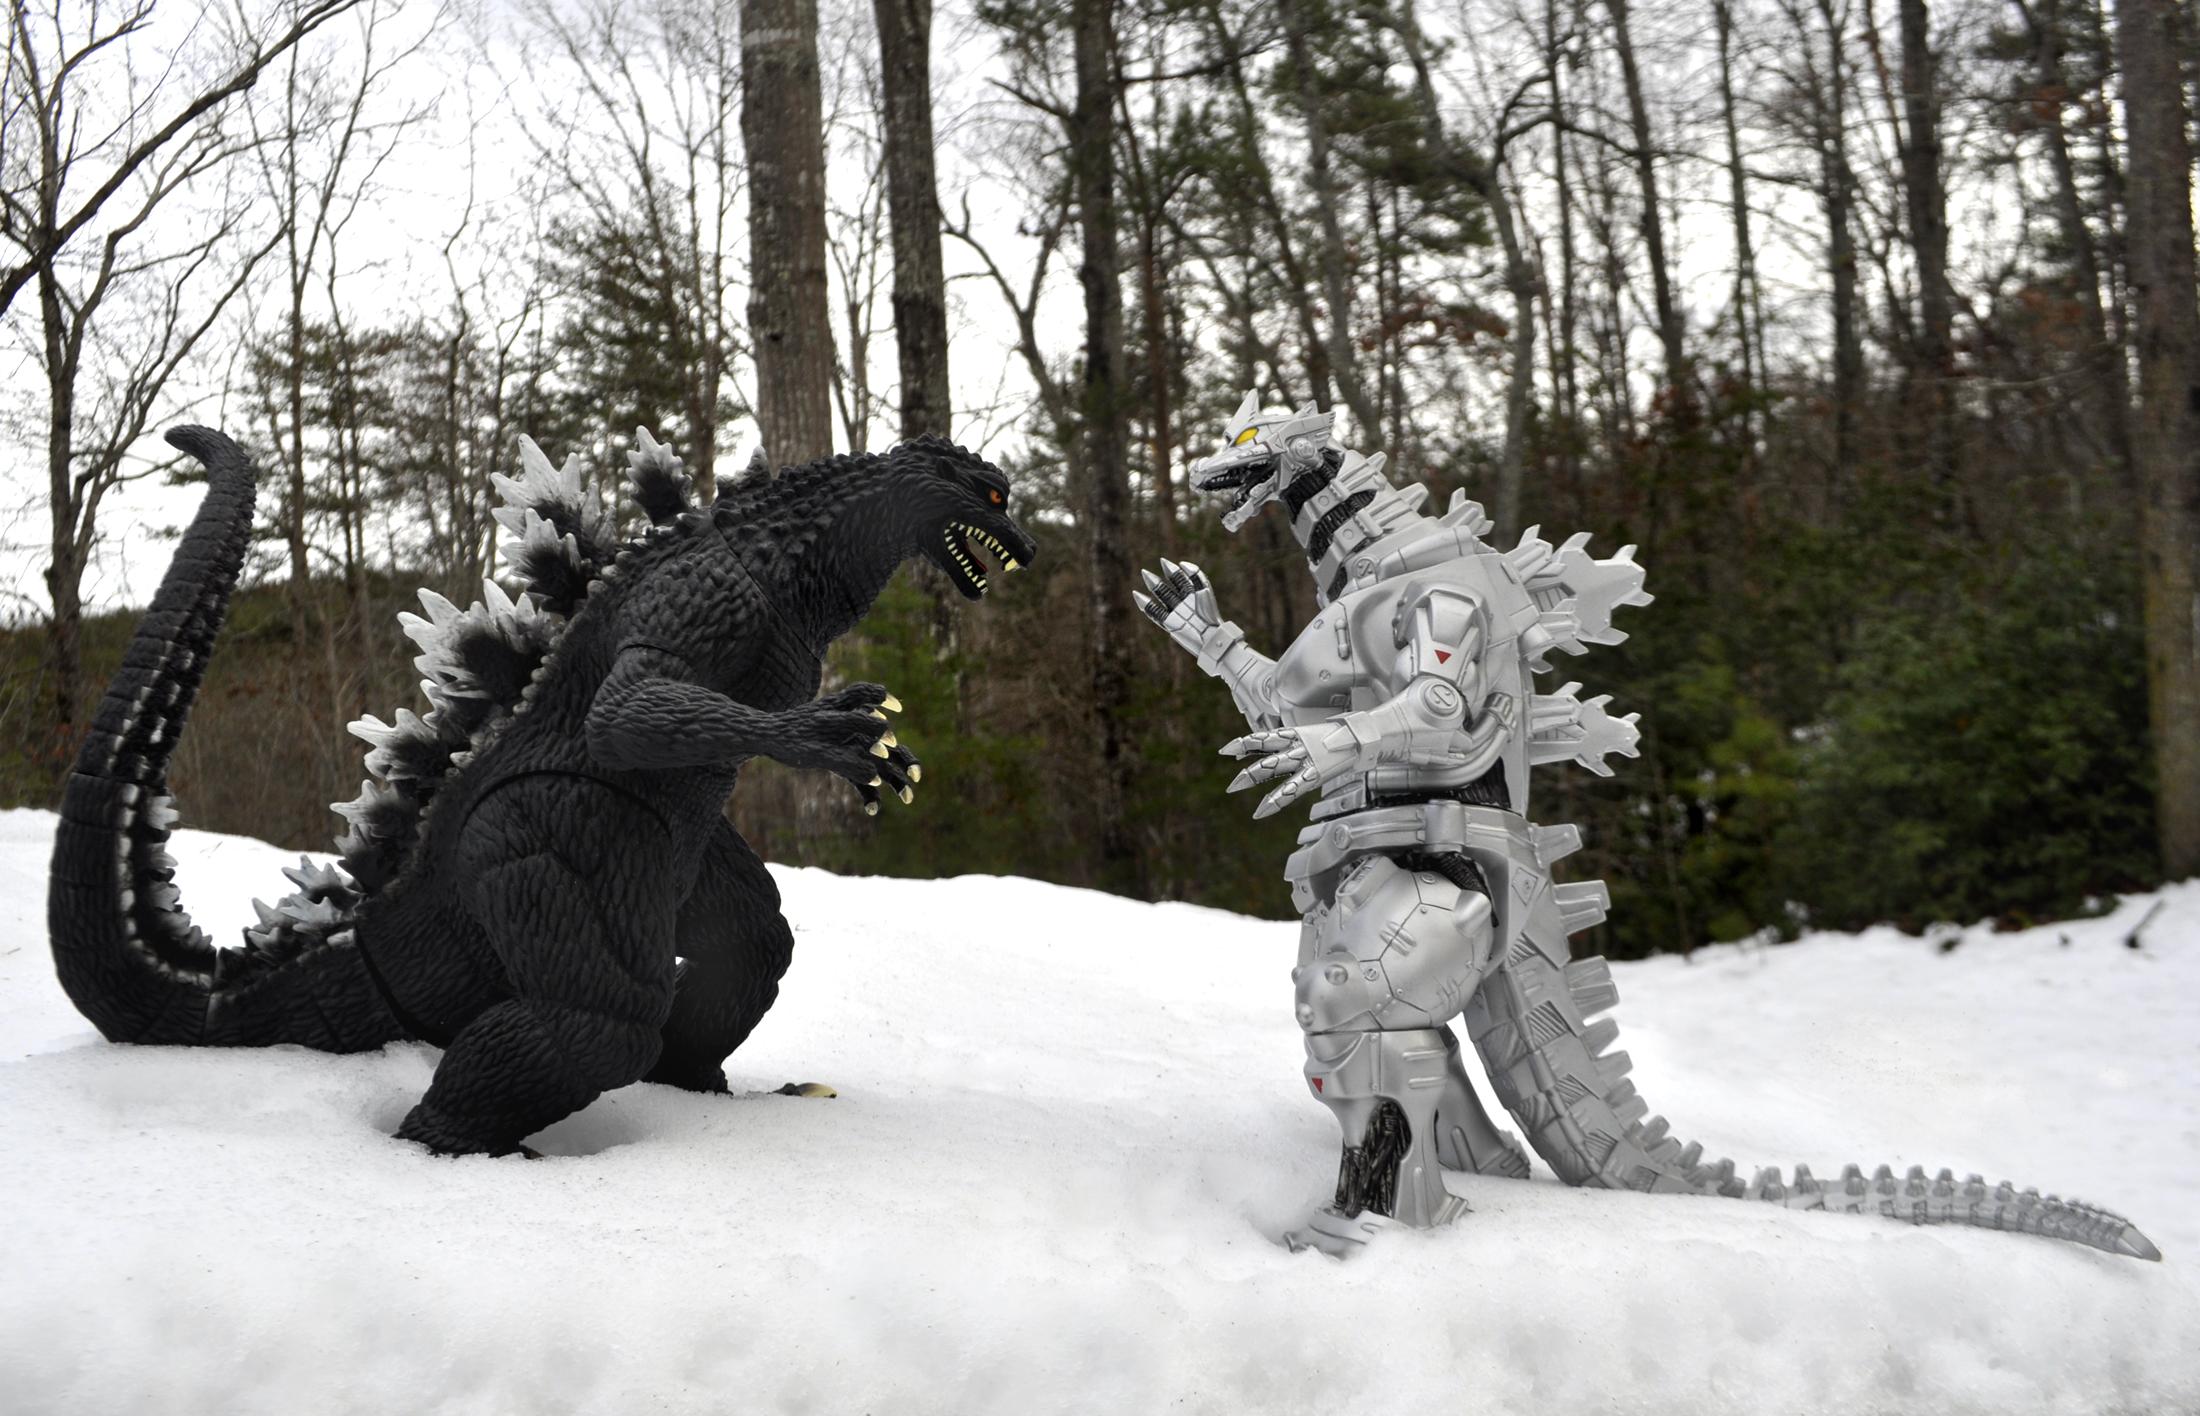 Godzilla Vs Mechagodzilla 2 Toys Godzilla vs MechagodzillaGodzilla Vs Mechagodzilla 2 Toys